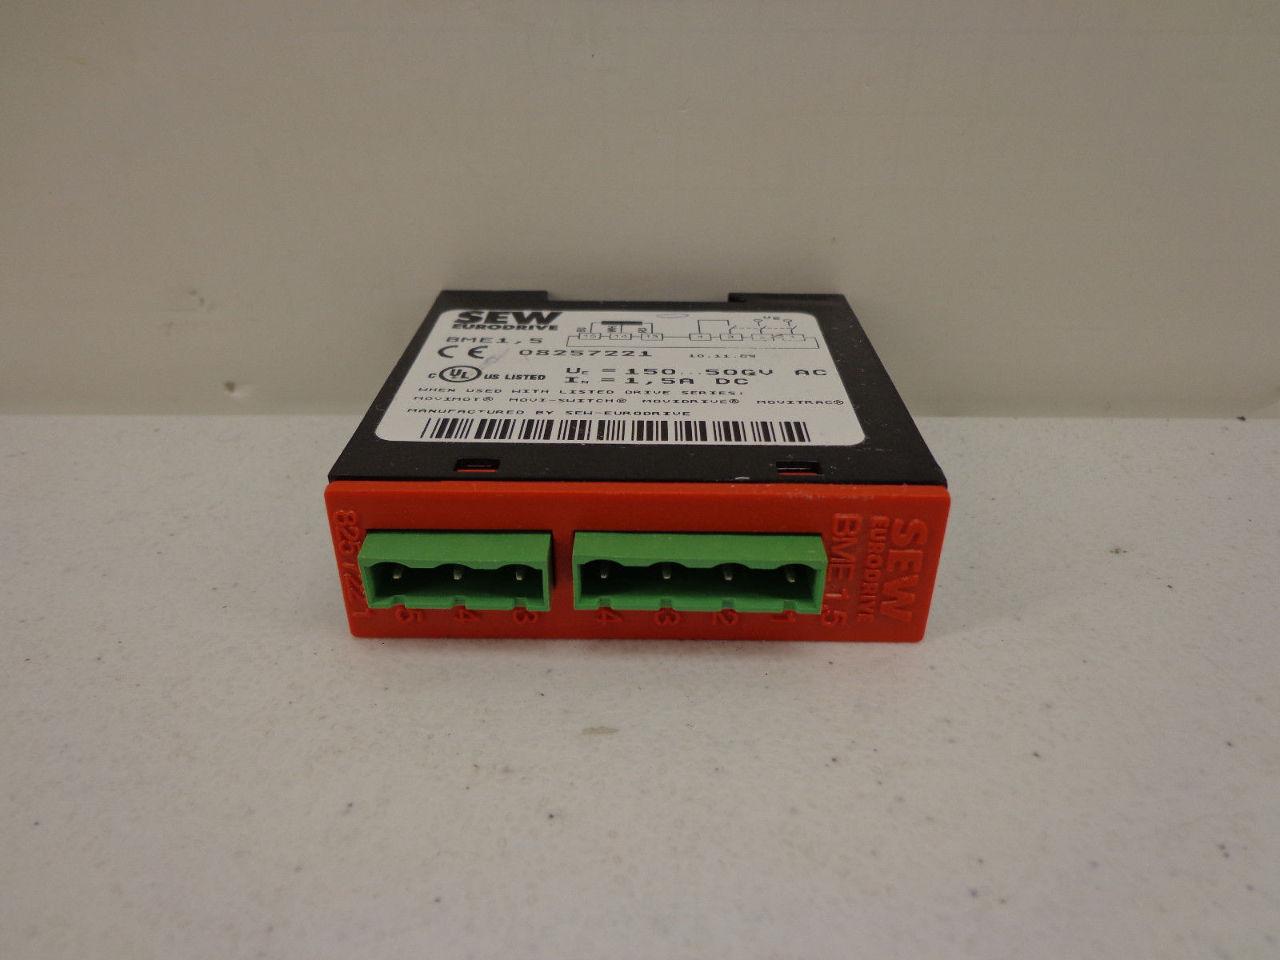 Sew Eurodrive 08257221 Bme 1 5 Motor Brake Rectifier Plc